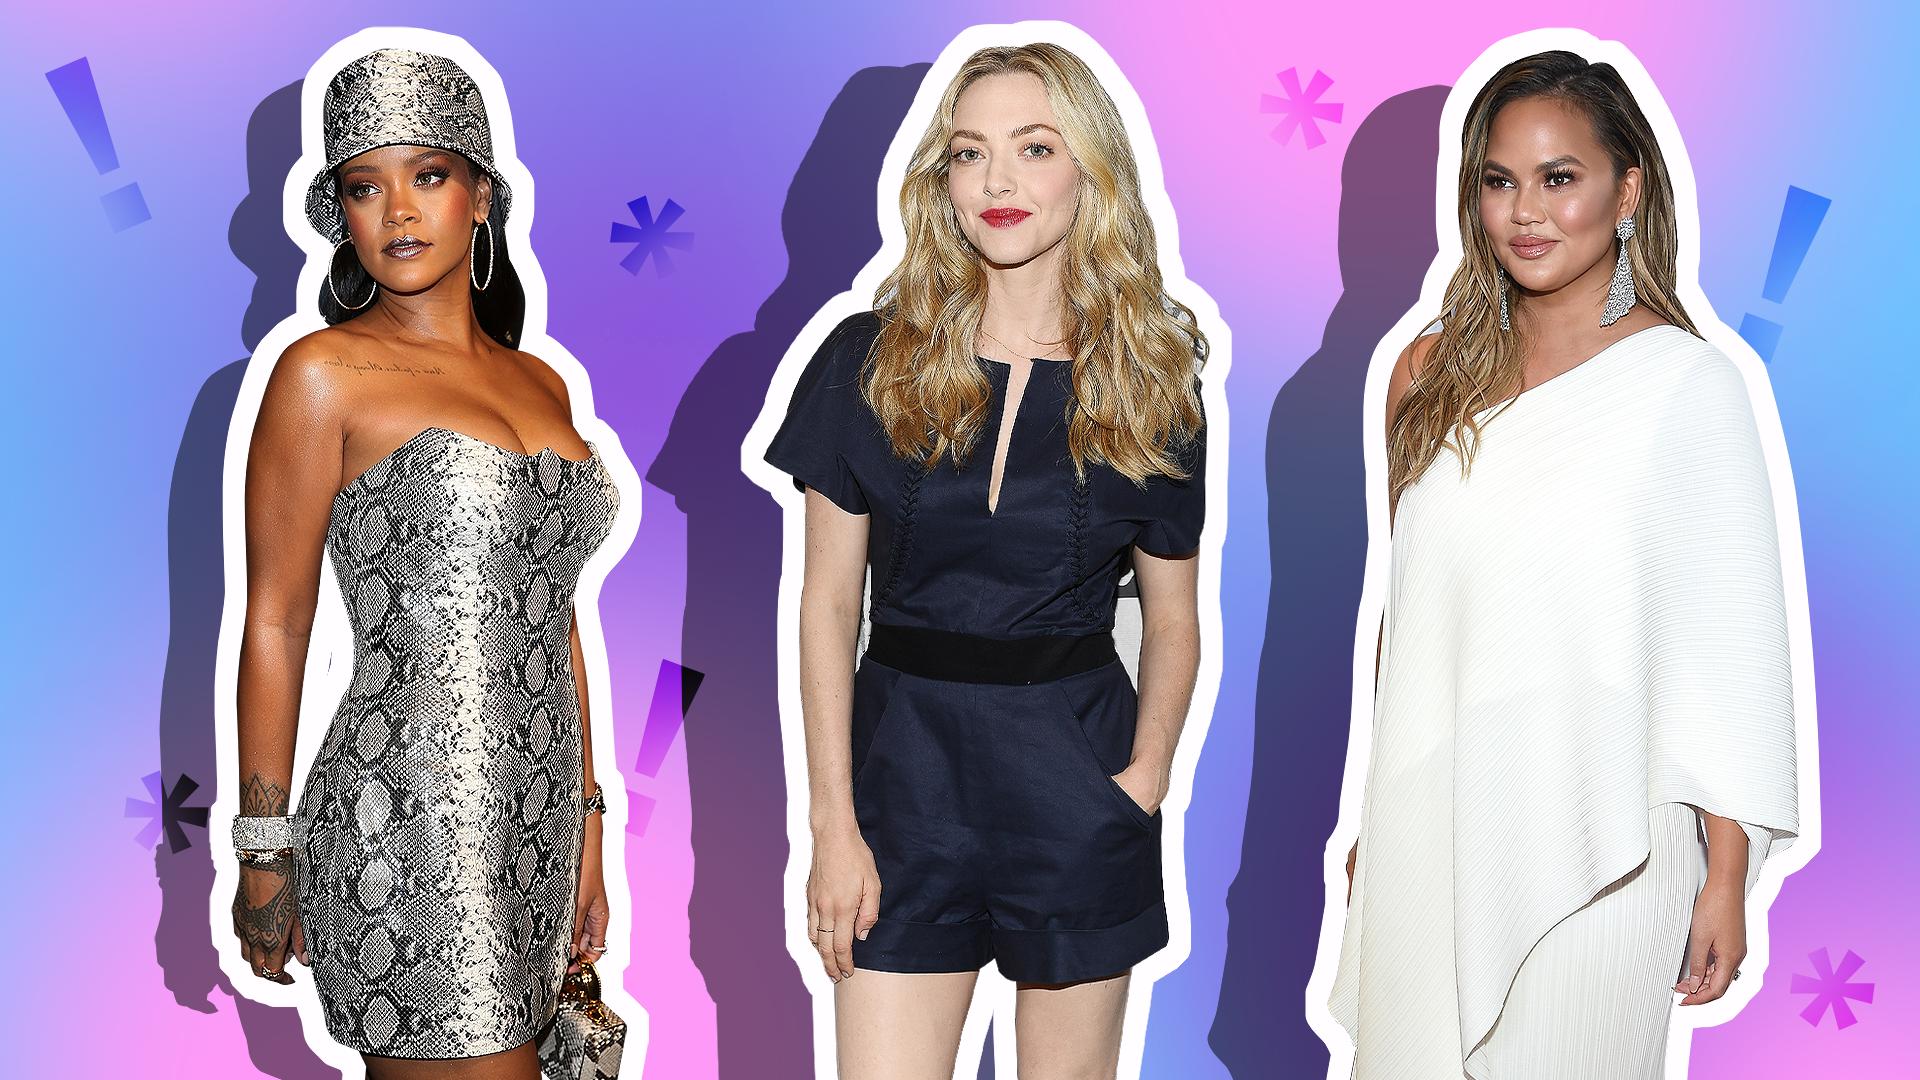 13 Celebrity Names We've Been Pronouncing Wrong